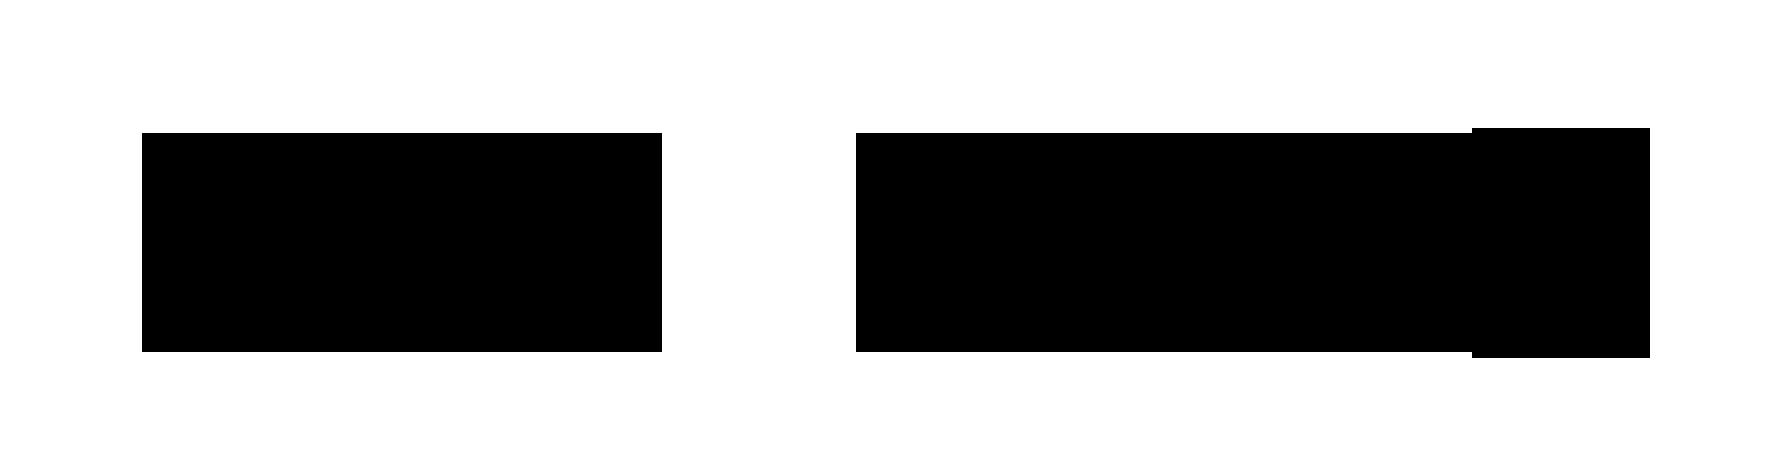 Epic records logo 2013